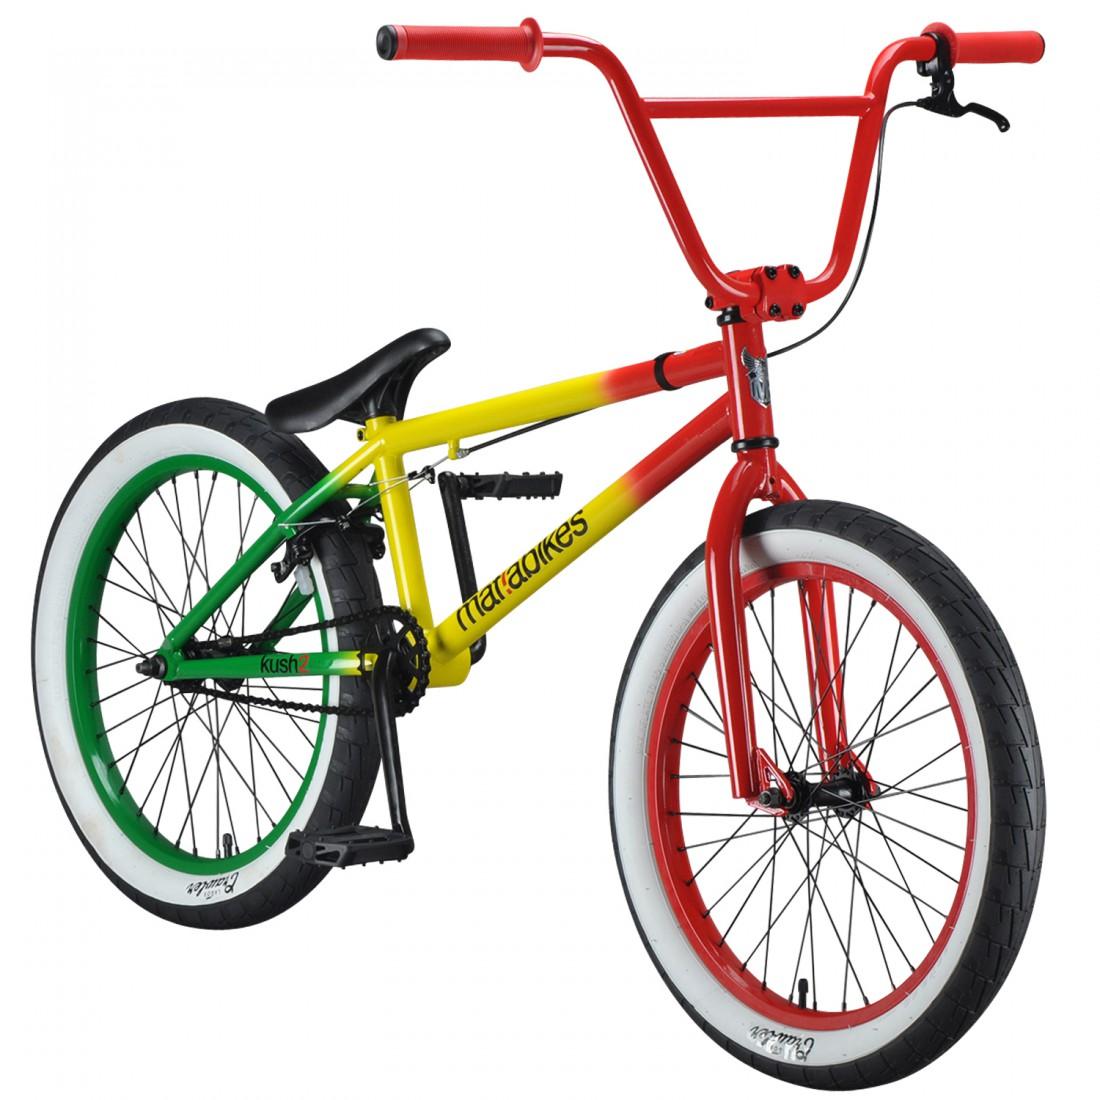 20 zoll mafiabikes bmx bike kush 2 0 verschiedene. Black Bedroom Furniture Sets. Home Design Ideas